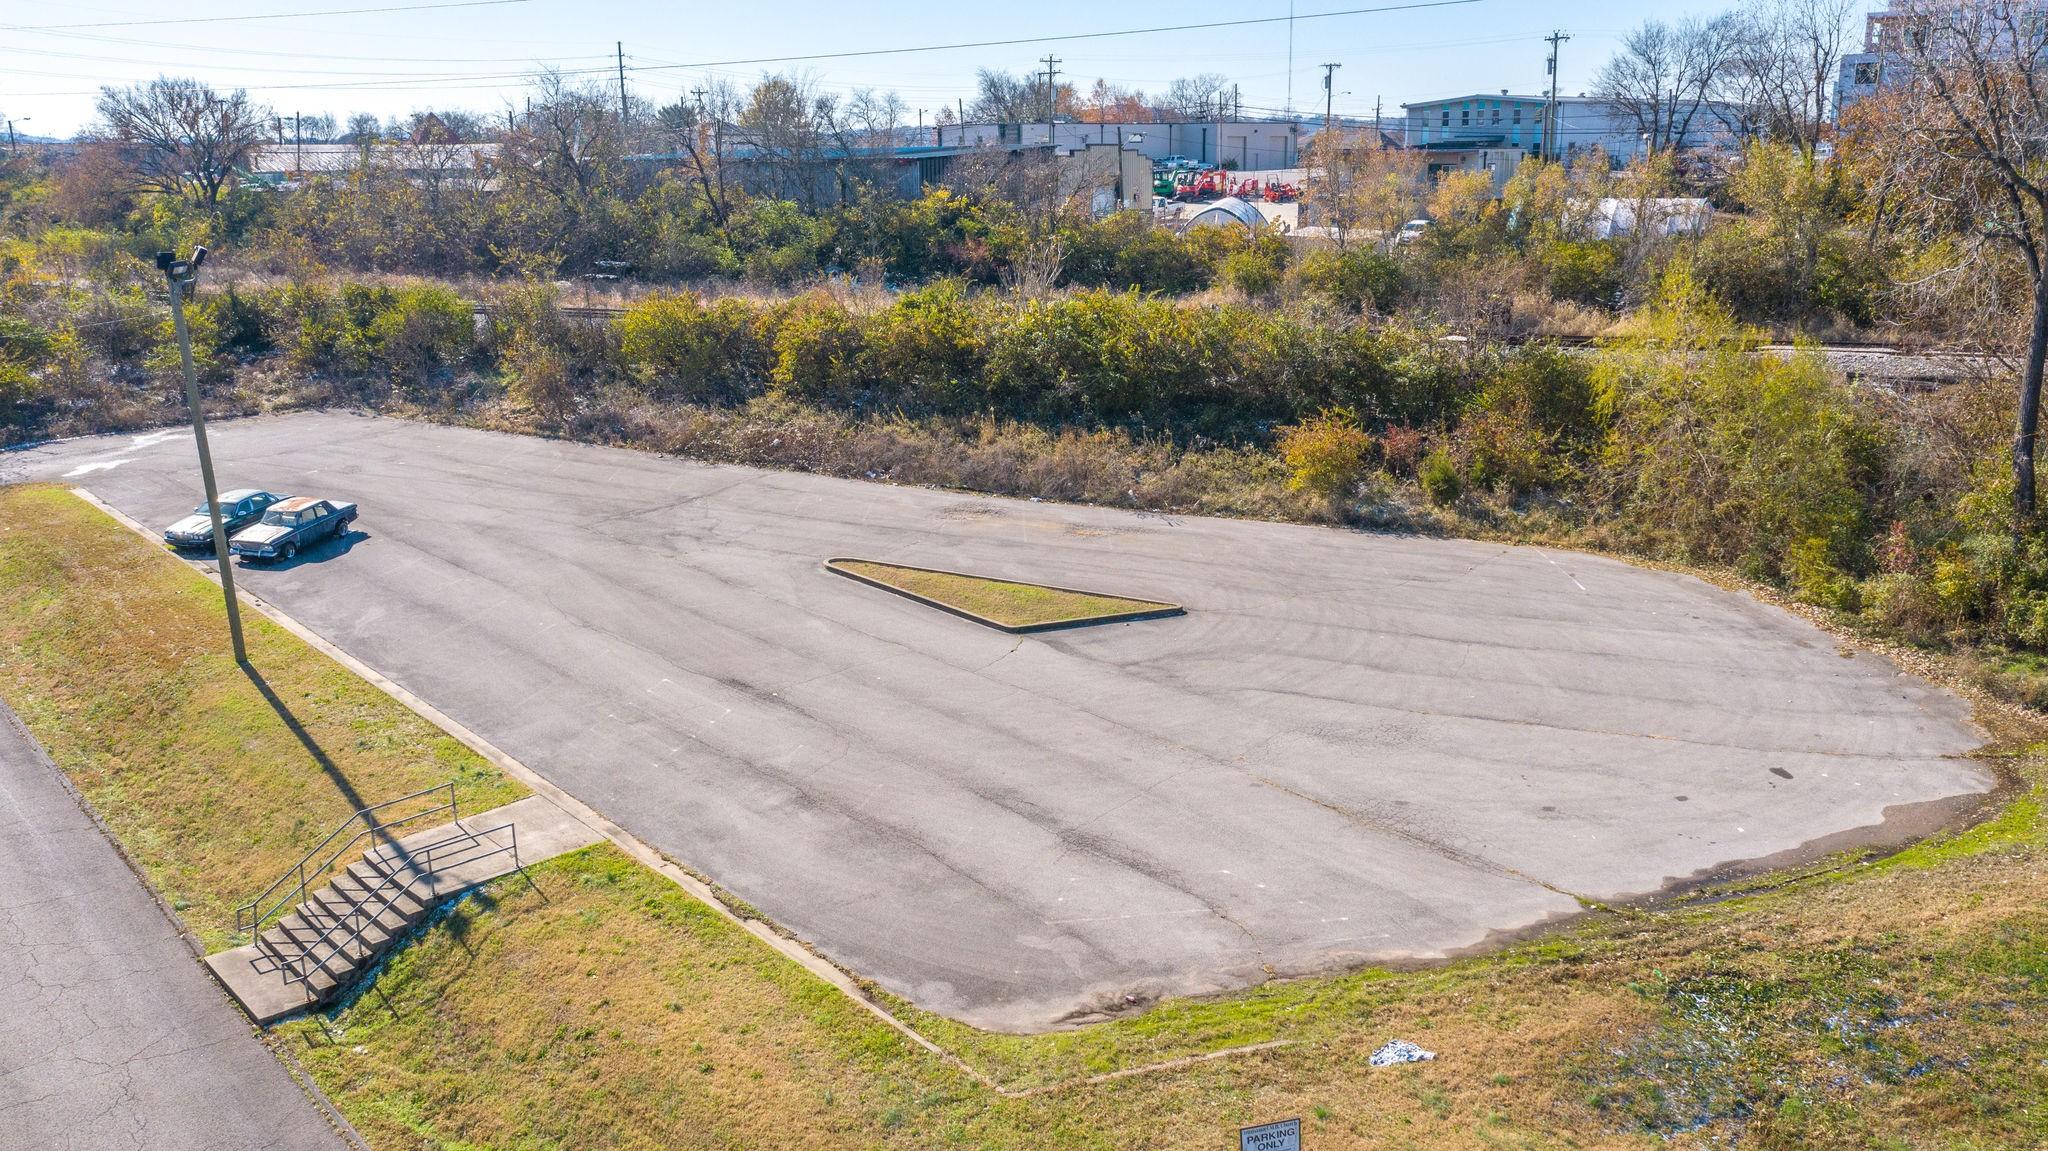 913 43rd Ave, N, Nashville, TN 37209 - Nashville, TN real estate listing